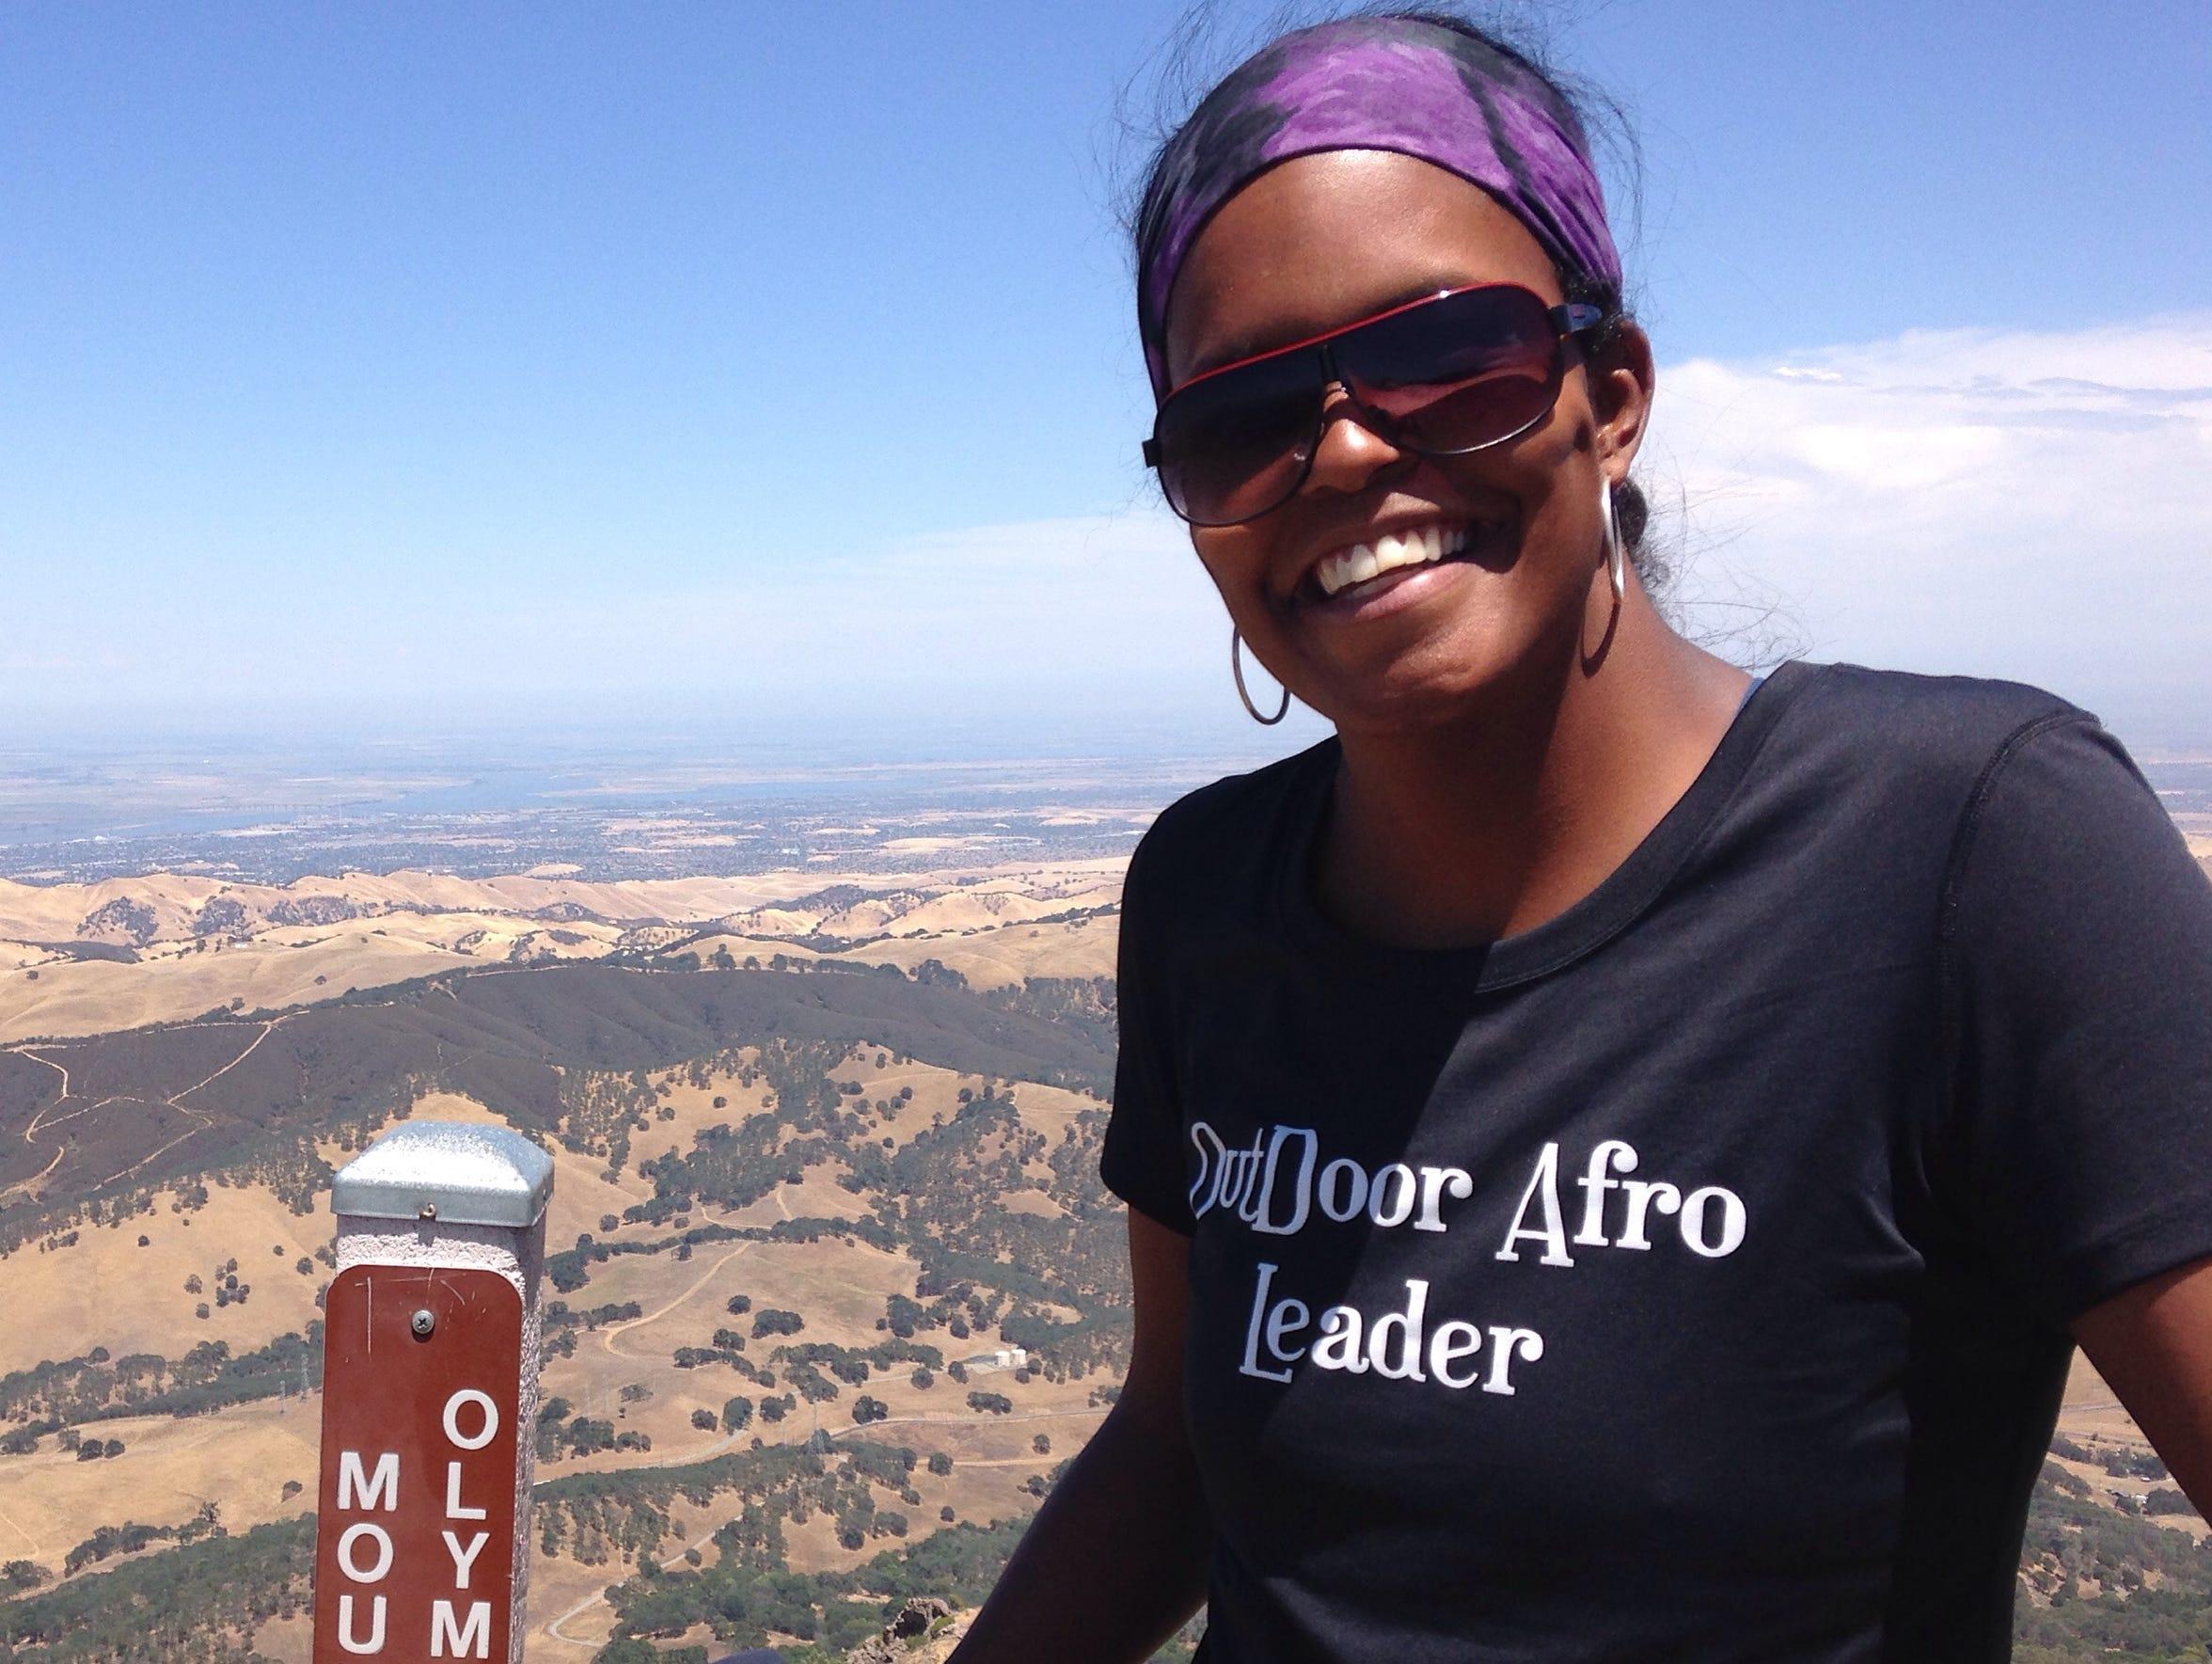 Zoe Polk is a San Francisco-based national program